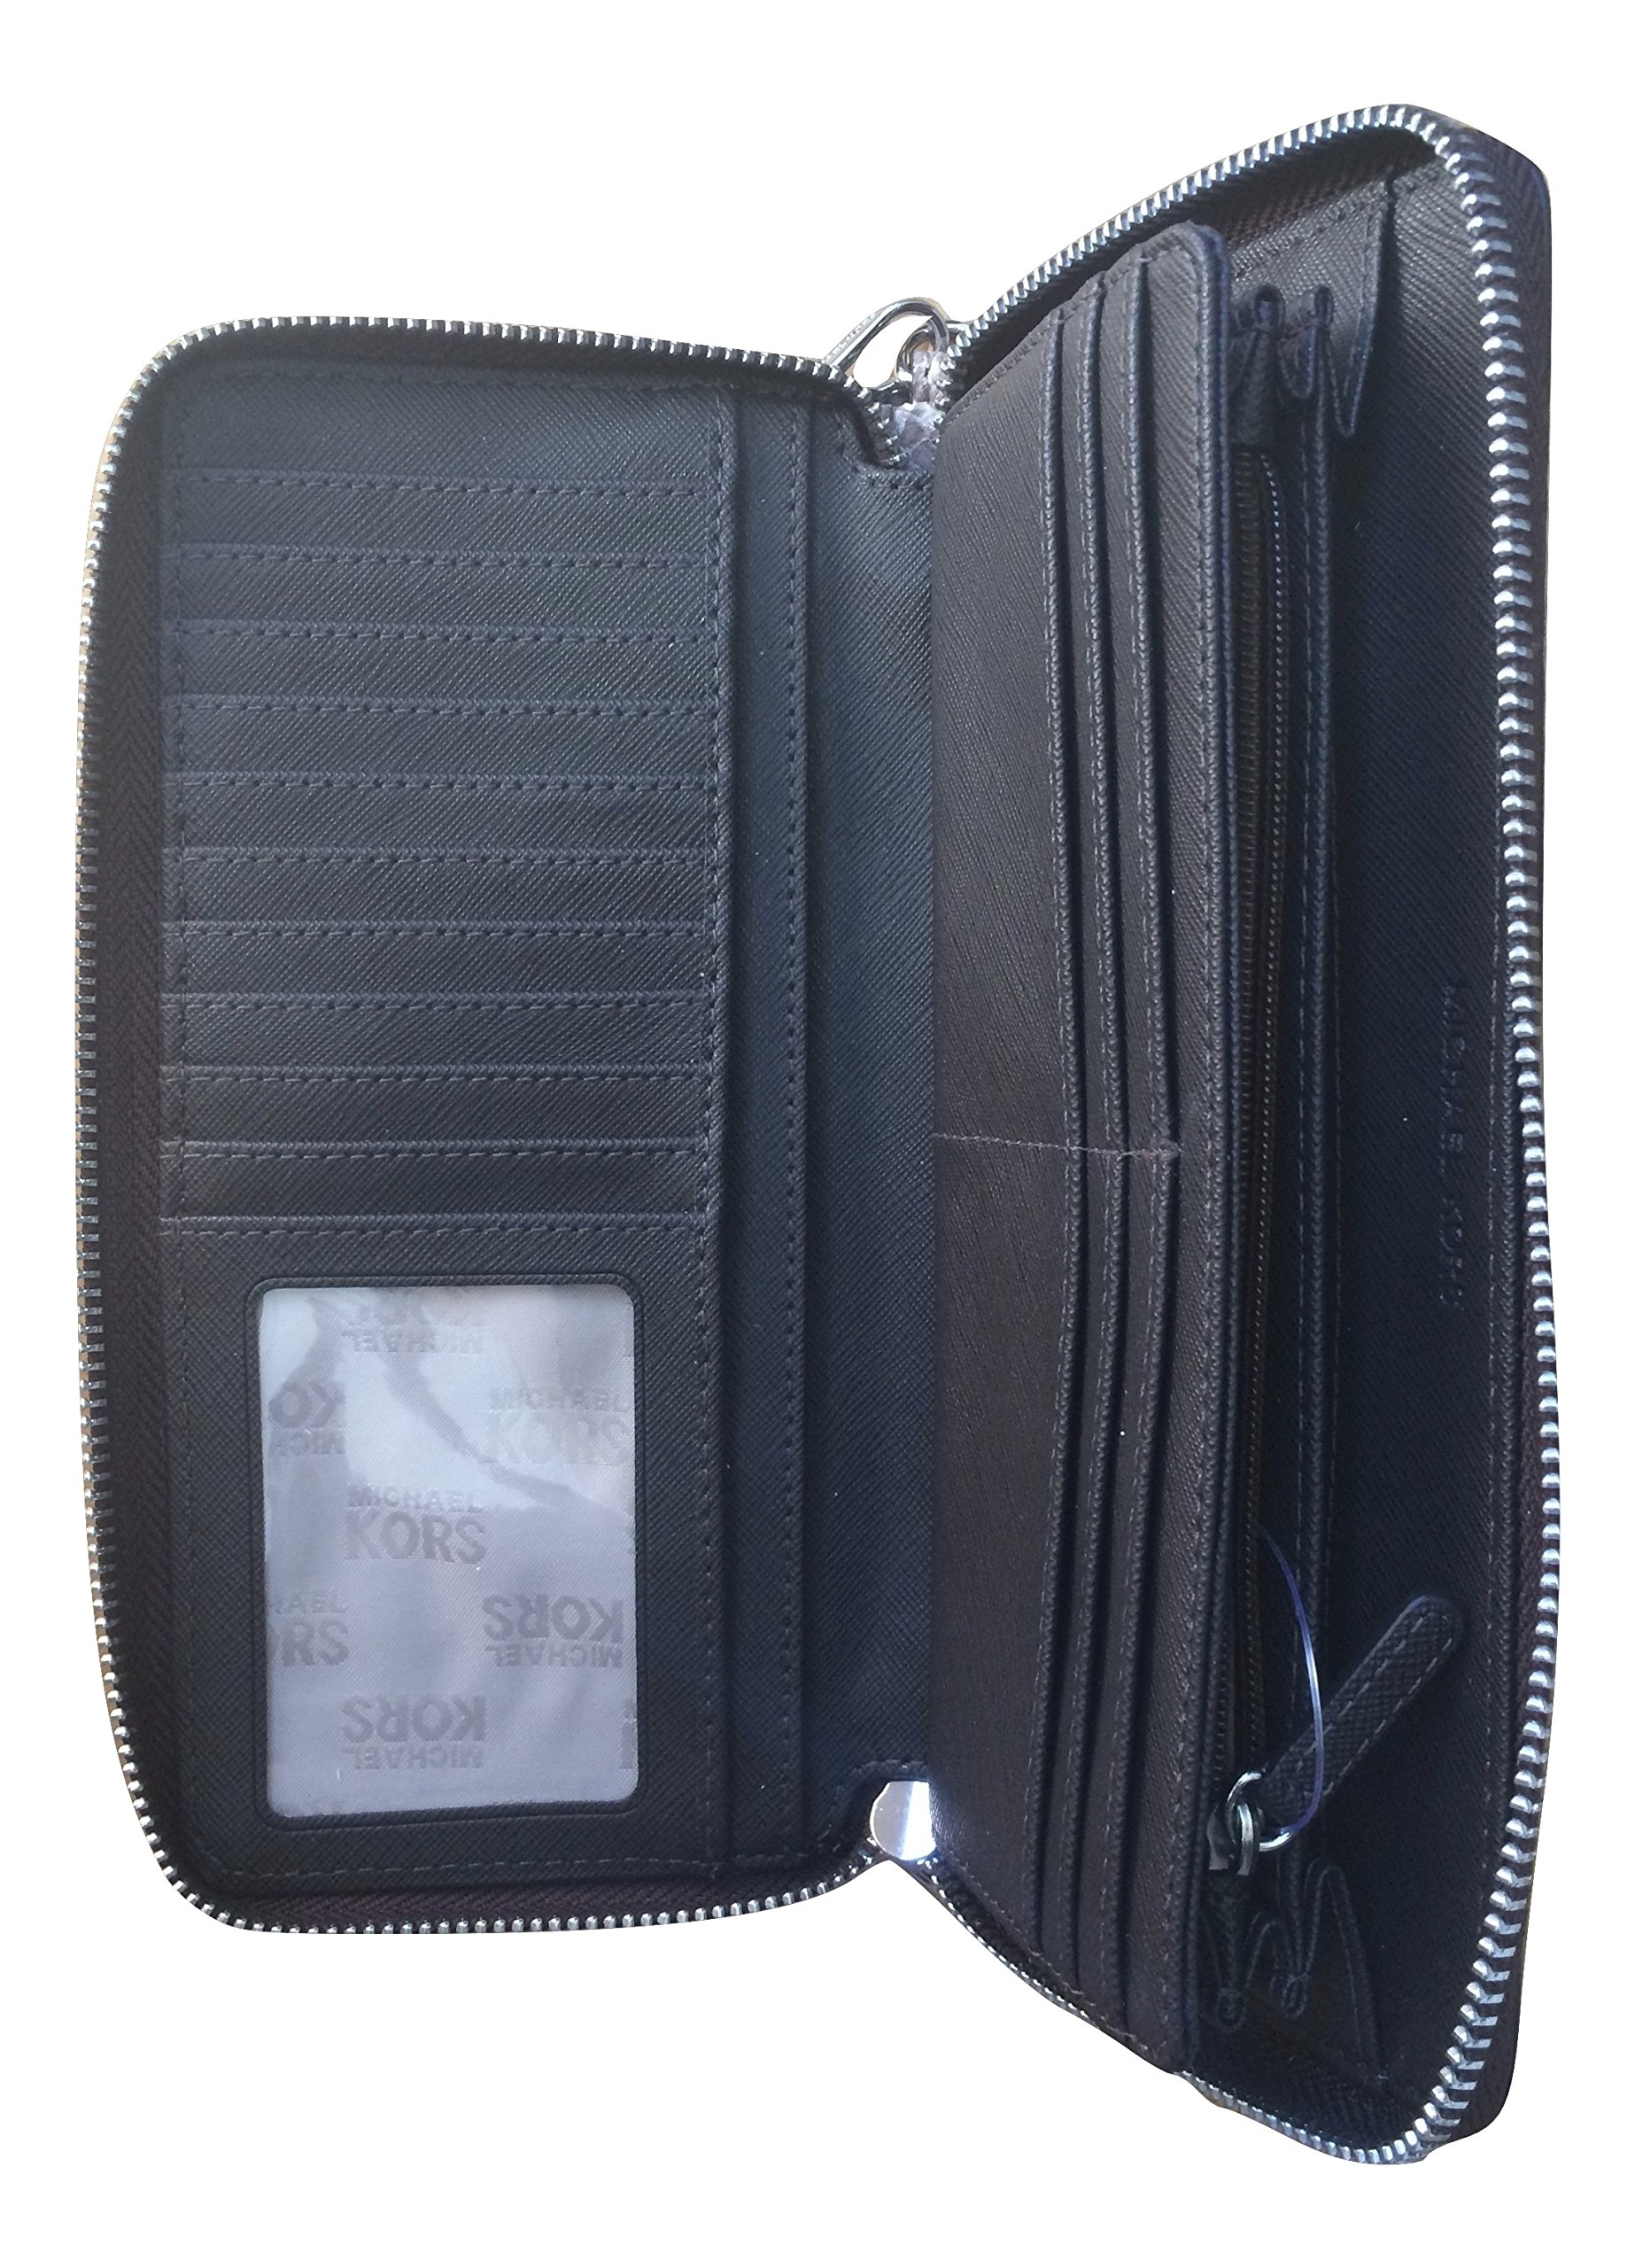 Michael Kors Leather Jet Set Travel Embossed Leather Continental Zip Around Wallet Wristlet (Dark Sand) by Michael Kors (Image #3)